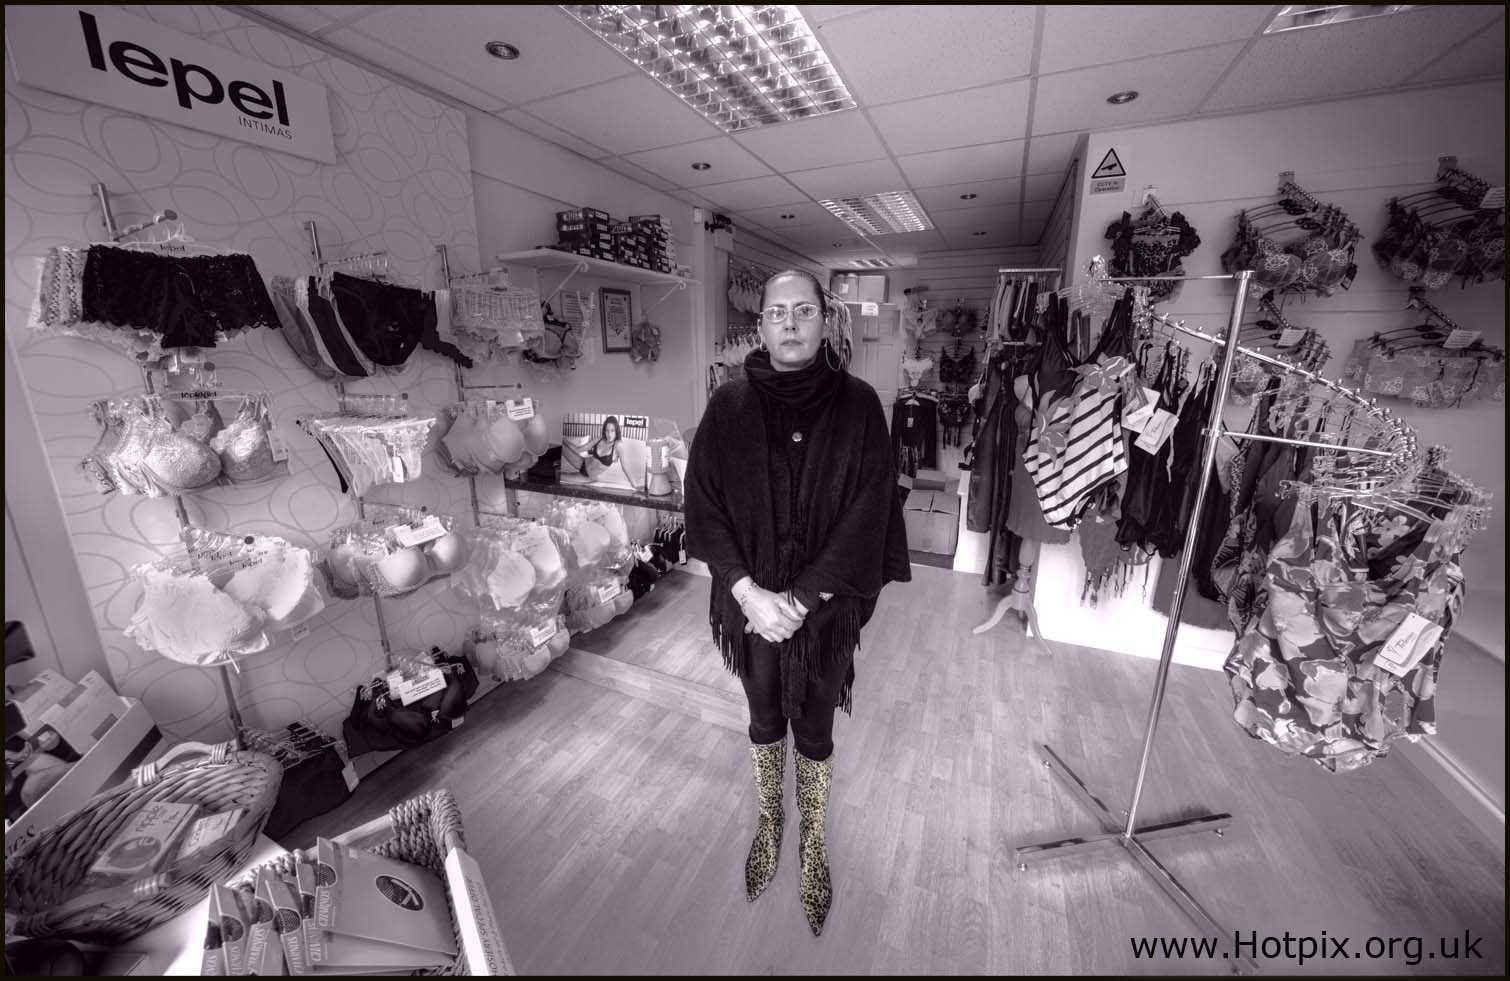 lingerie,swim,wear,swimwear,under,underwear,designer,grappenhall,warrington,cheshire,england,UK,britain,lindaann,linda,ann,la,bonita,shop,store,nice,friendly,lady,woman,hotpics,hotpic,hotpick,hotpicks,hot,pics,pix,picks,hotpix.freeserve.co.uk,interesting,people,person,persons,persona,interesante,12-24,sigma,wide angle lens,wide,sex,sexy,angle,wideangle,lens,12-24mm,10-20mm,muchacha,femenina,de,mujer,se\u00f1ora,female,girl,\u5973\u6027\u30e1\u30b9\u306e\u5973\u6027\u306e\u5973\u306e\u5b50,\u592b\u4eba\u5973\u6027\u5987\u5973\u5973\u5b69,fille,f\u00e9minine,femme,dame,hotpix!